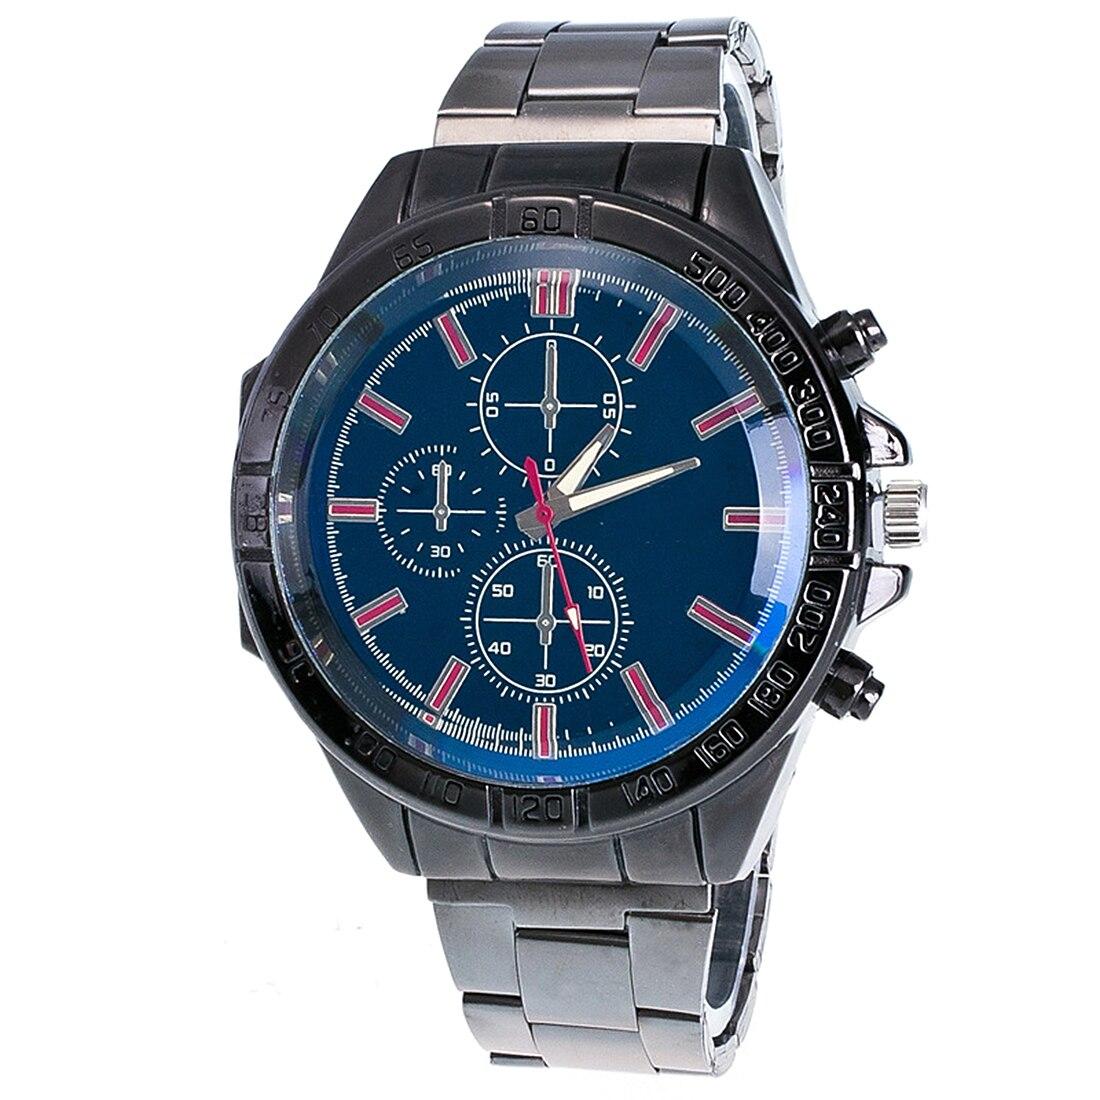 Men sport watches stainless steel three eyes analog quartz wristwatch military watch male business clock 2018 relogio masculino